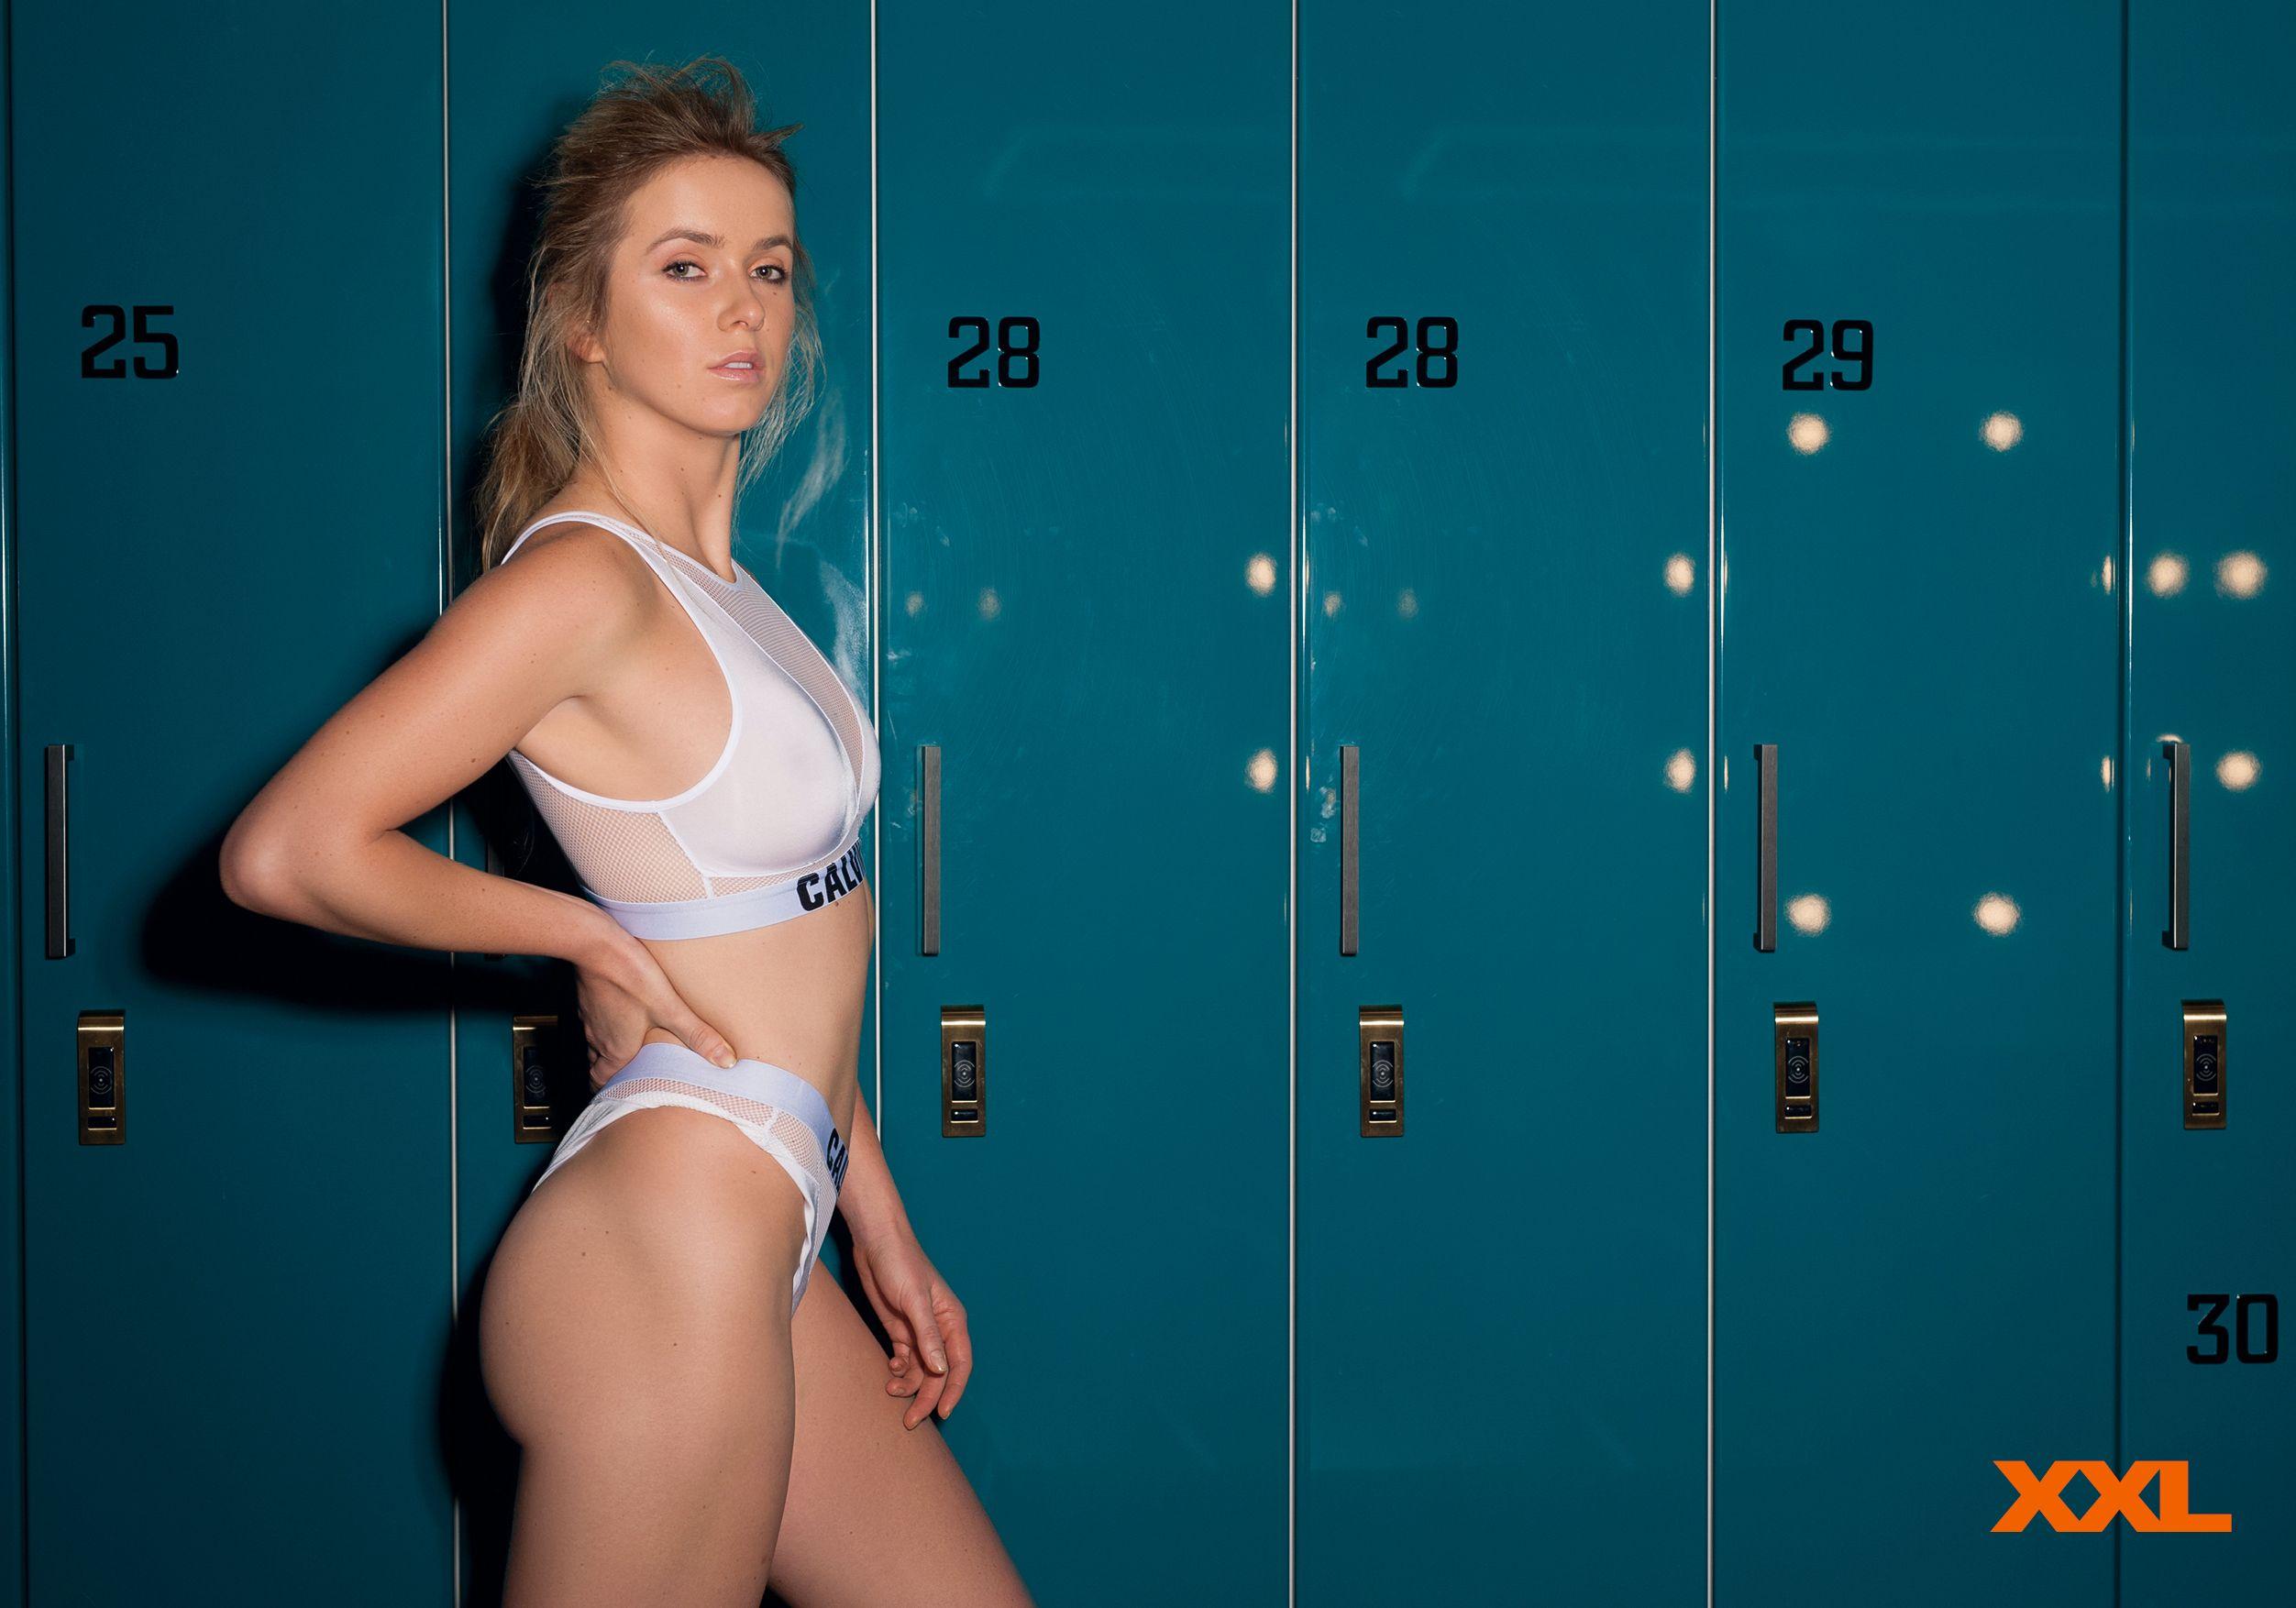 Elina-Svitolina-Sexy-Topless-3-thefappeningblog.com_.jpg